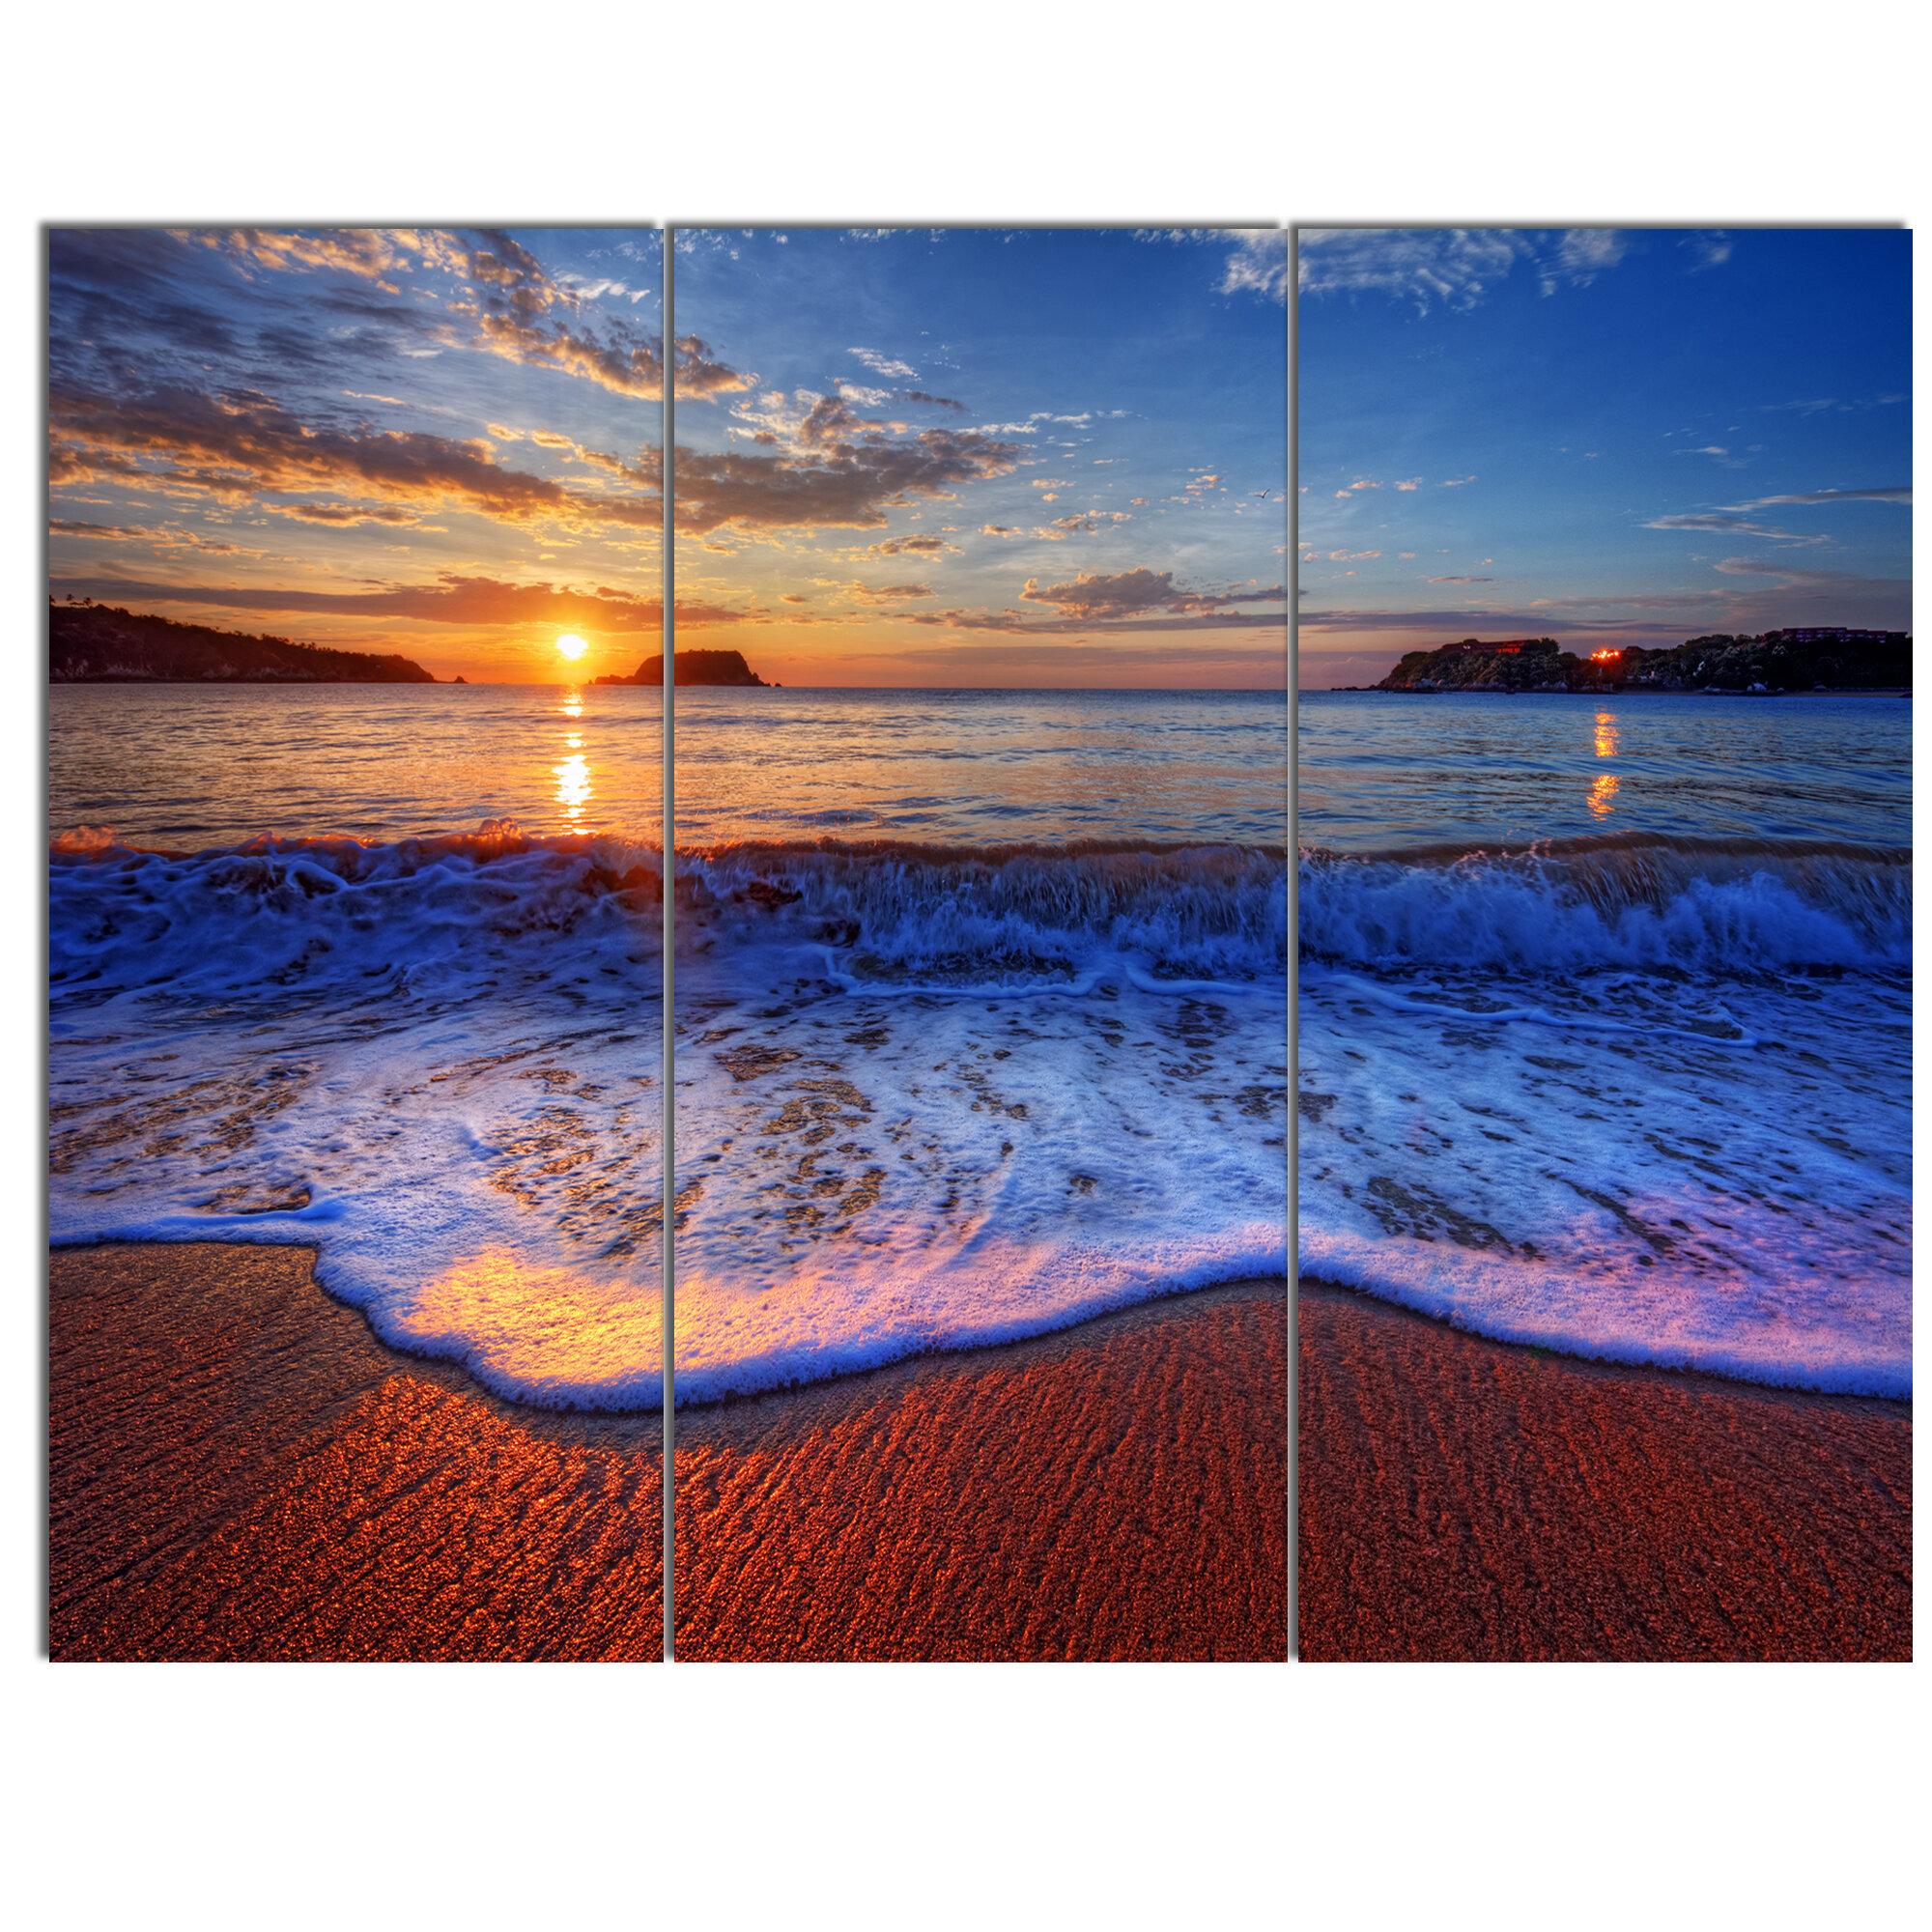 Designart Blue Waves On Sandy Beach 3 Piece Photographic Print On Wrapped Canvas Set Wayfair